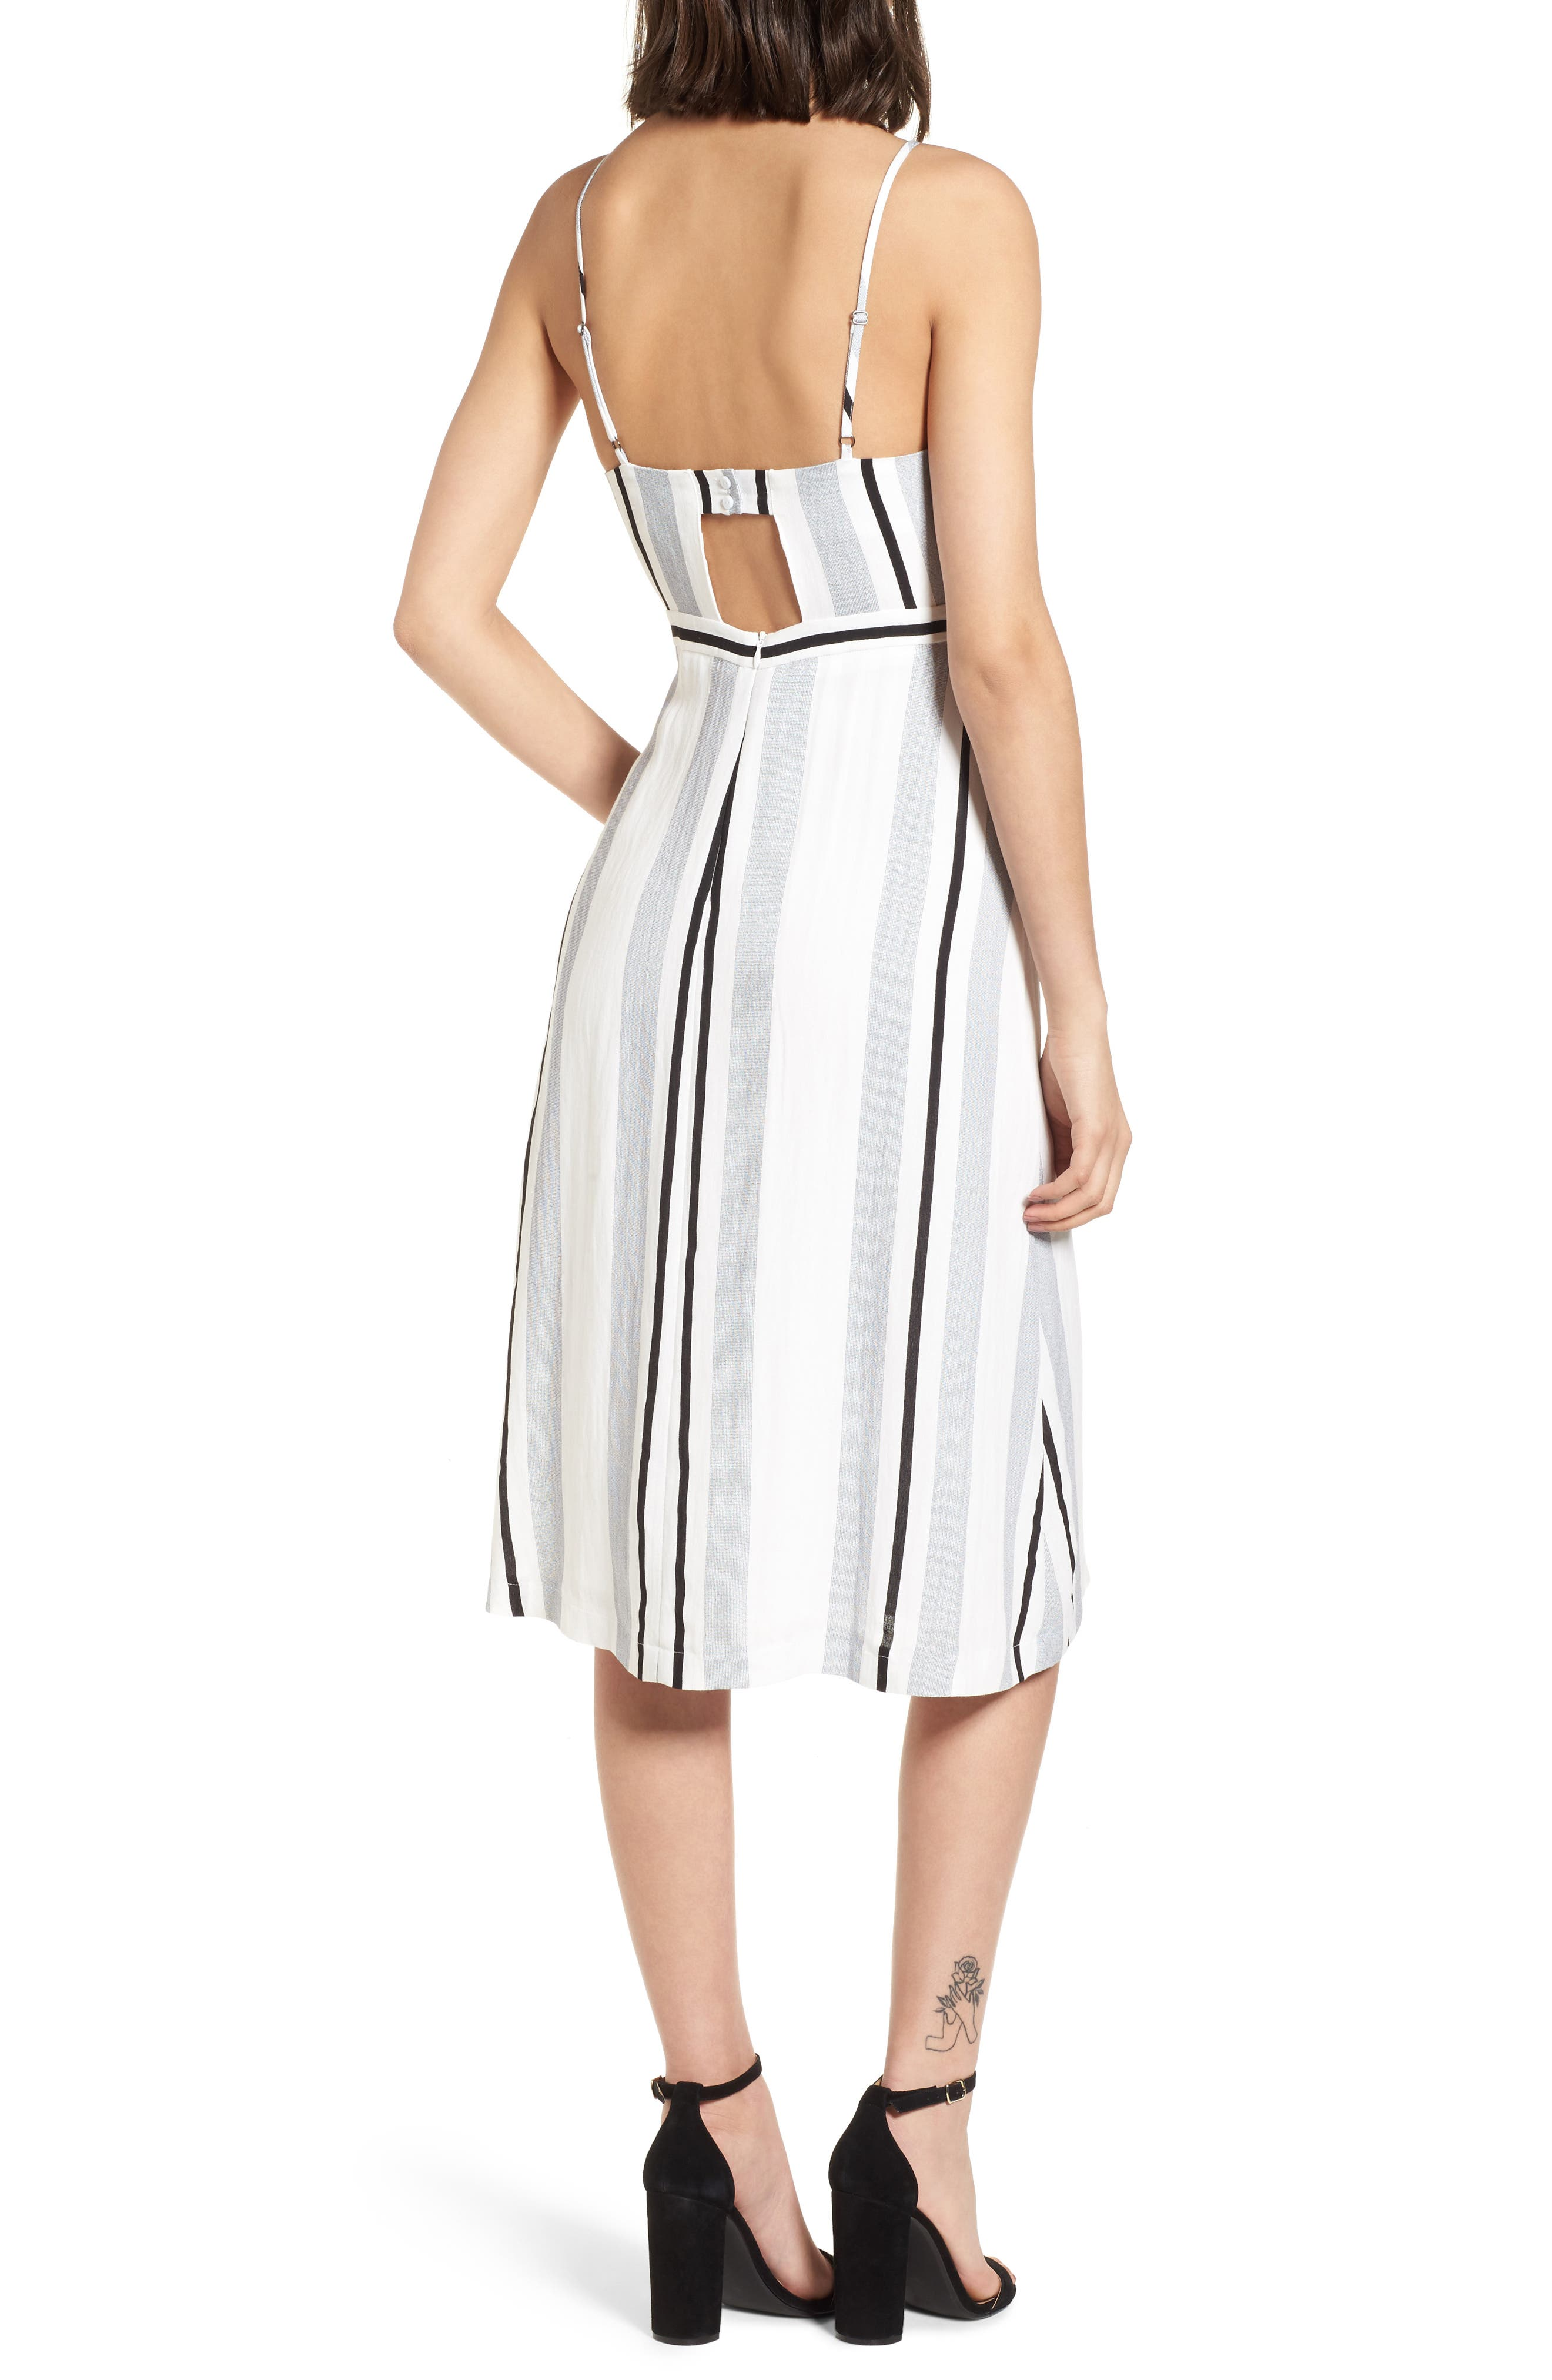 Stripe Tie Front Midi Dress,                             Alternate thumbnail 2, color,                             Blue/ White Stripe